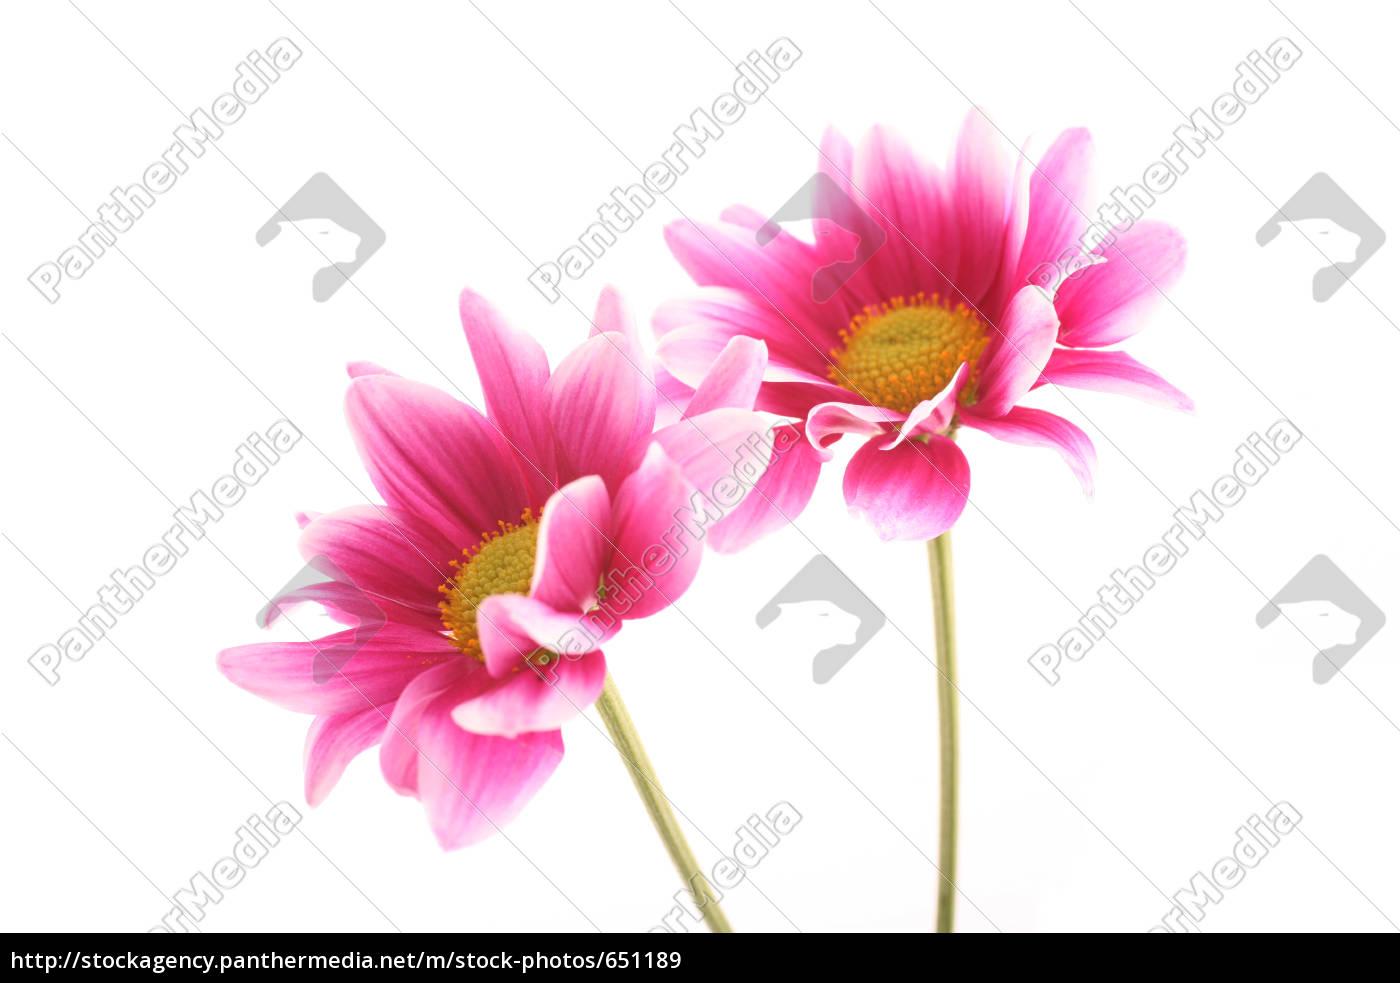 chrysanthemum, (chrysanthemum) - 651189